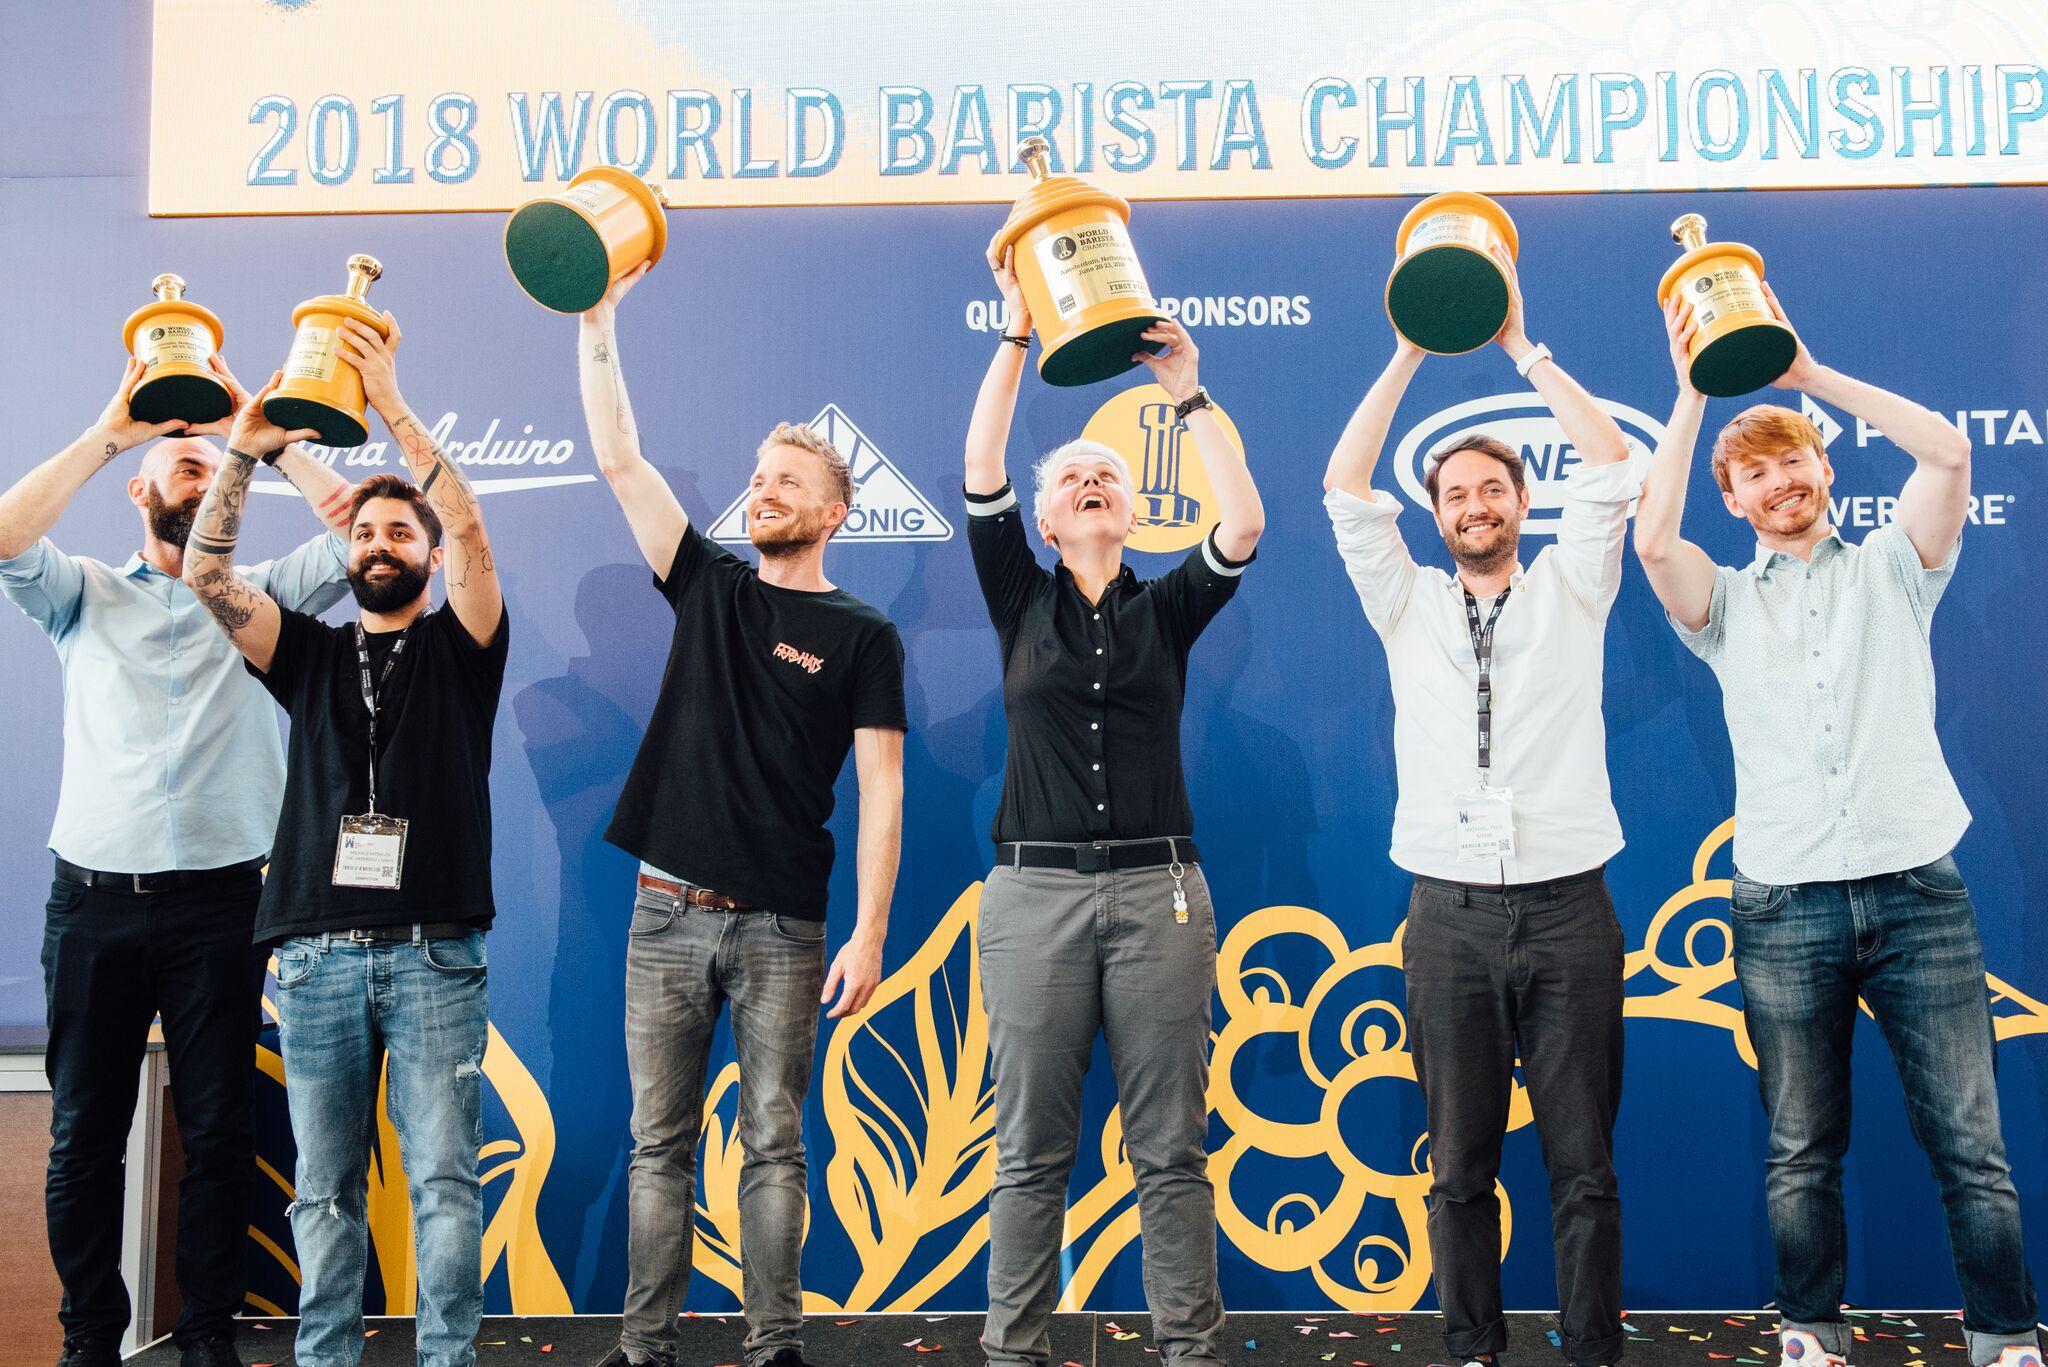 World Barista Champion Agnieszka Rojewska makes history - BeanScene